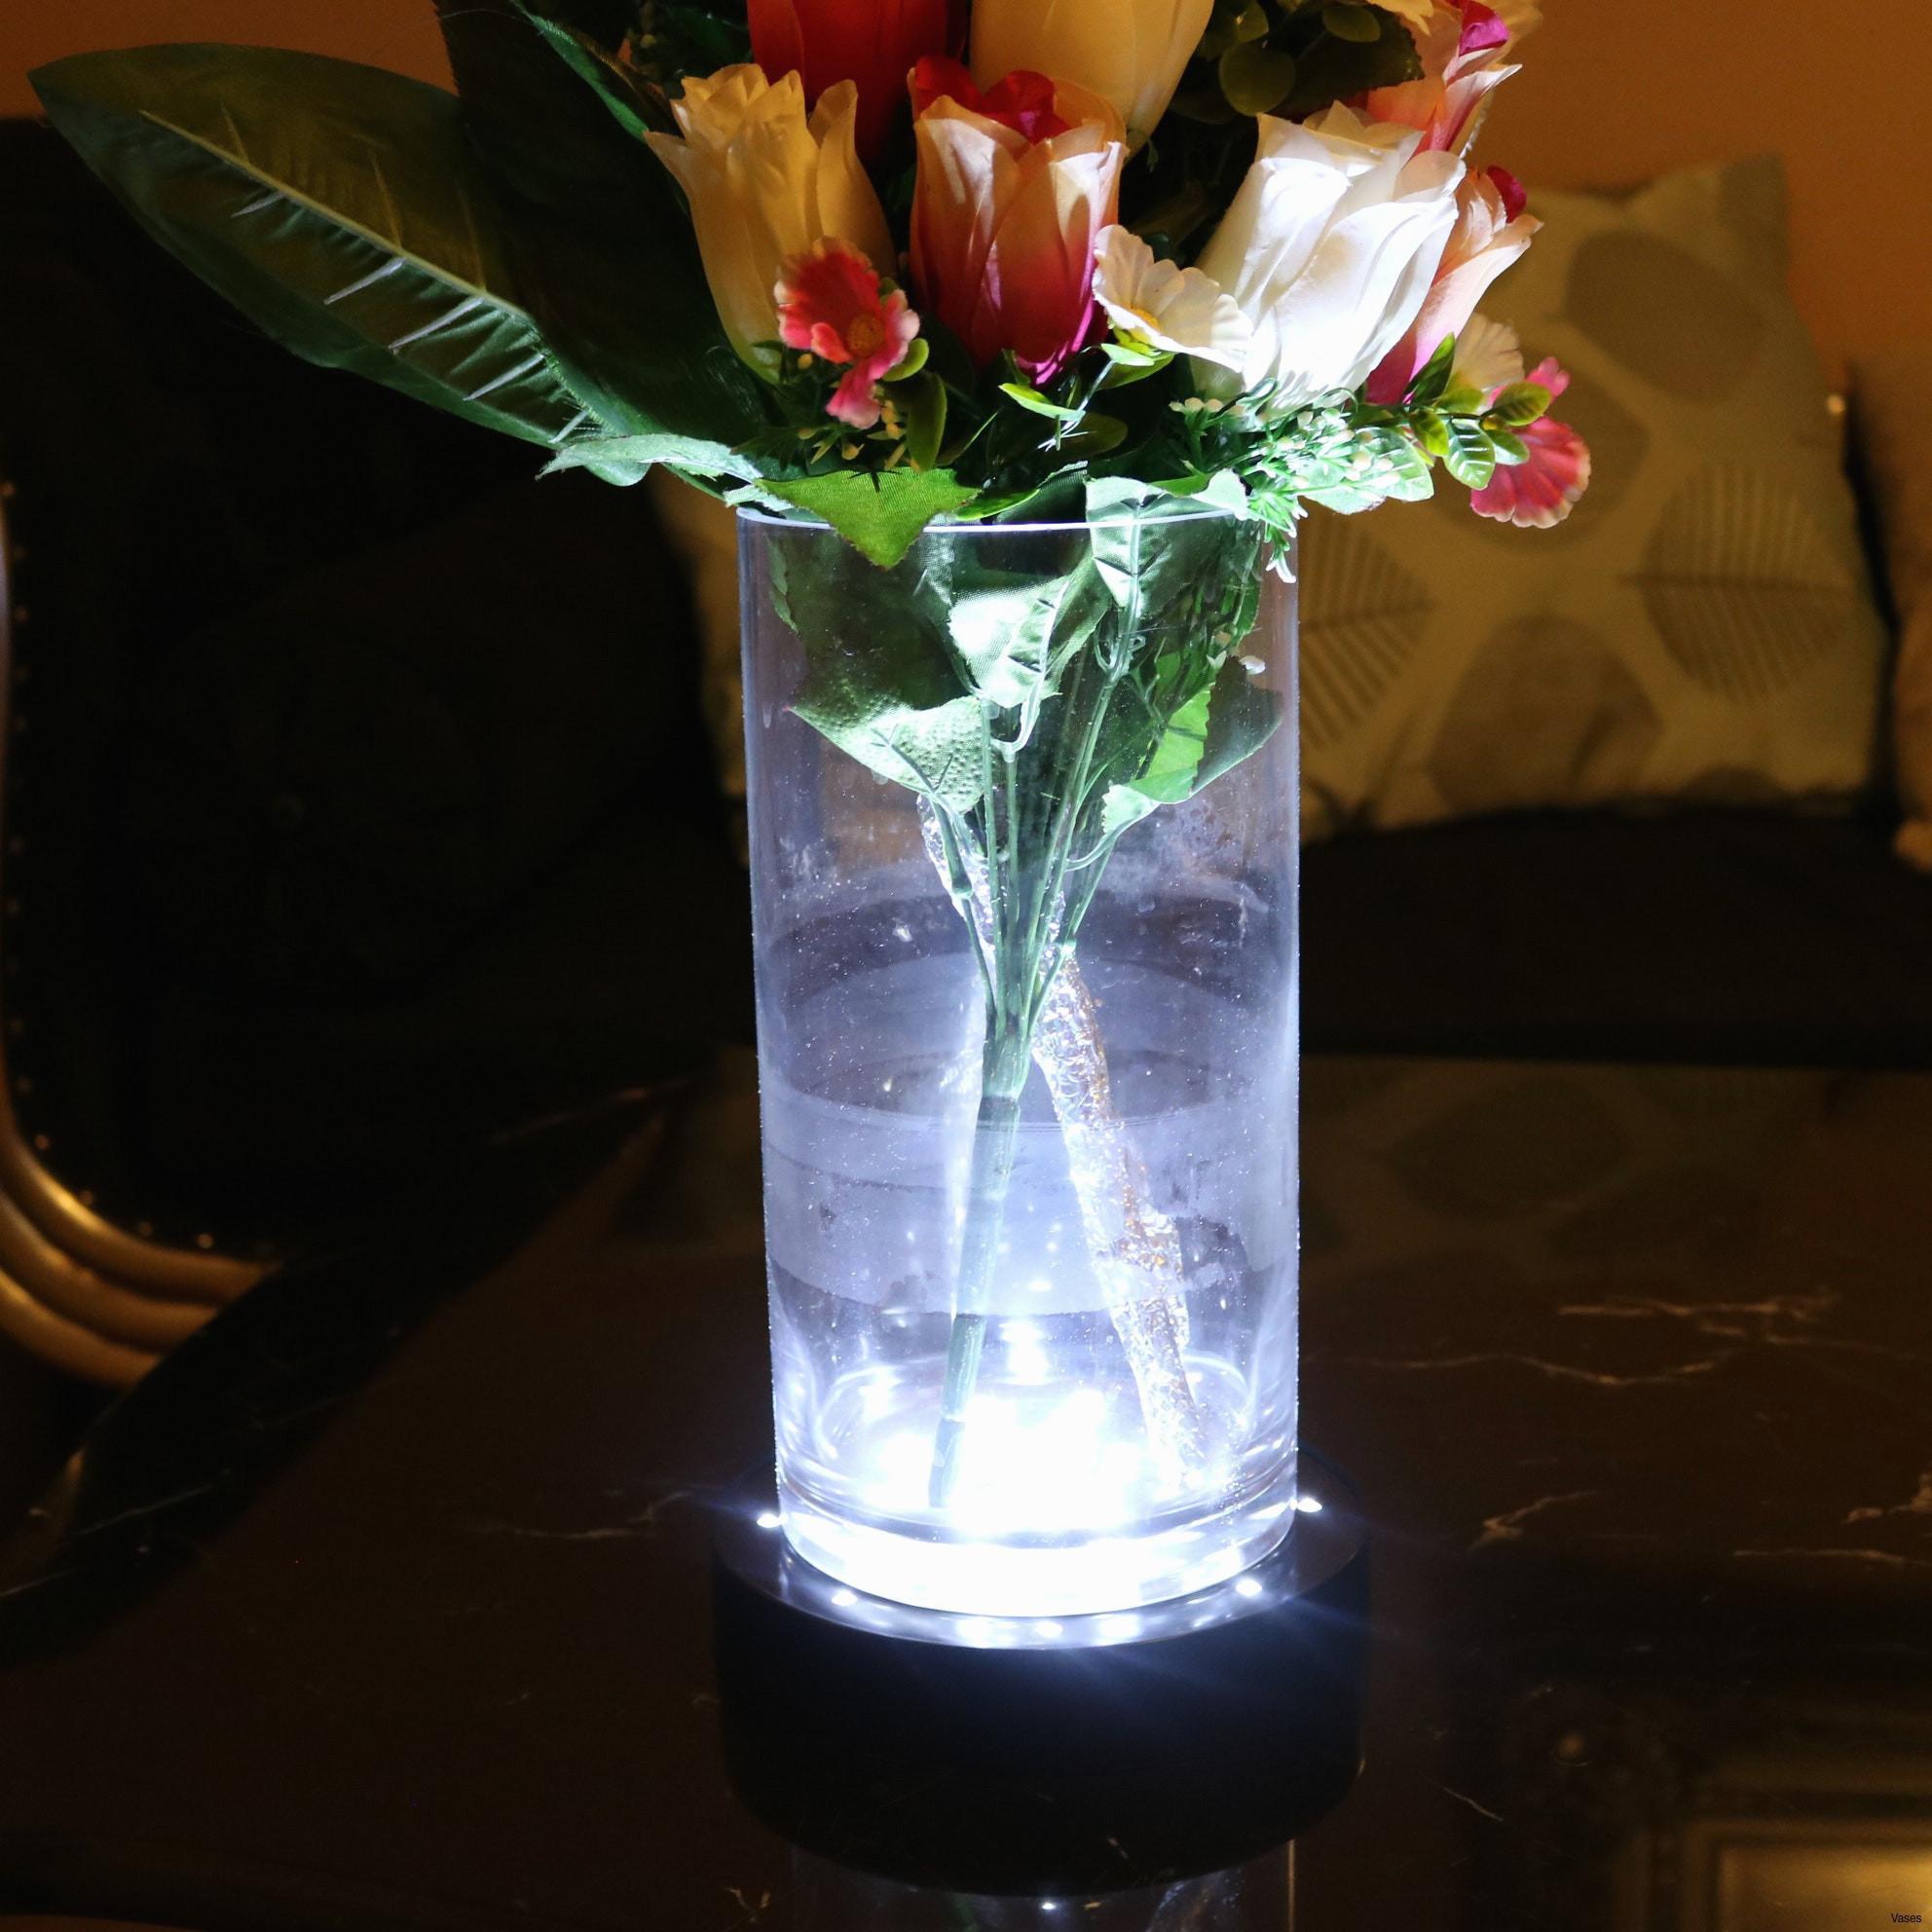 floor vase and flowers of 6 elegant flower die cut pictures best roses flower within inspirational vases disposable plastic single cheap flower rose vasei 0d design of 6 elegant flower die